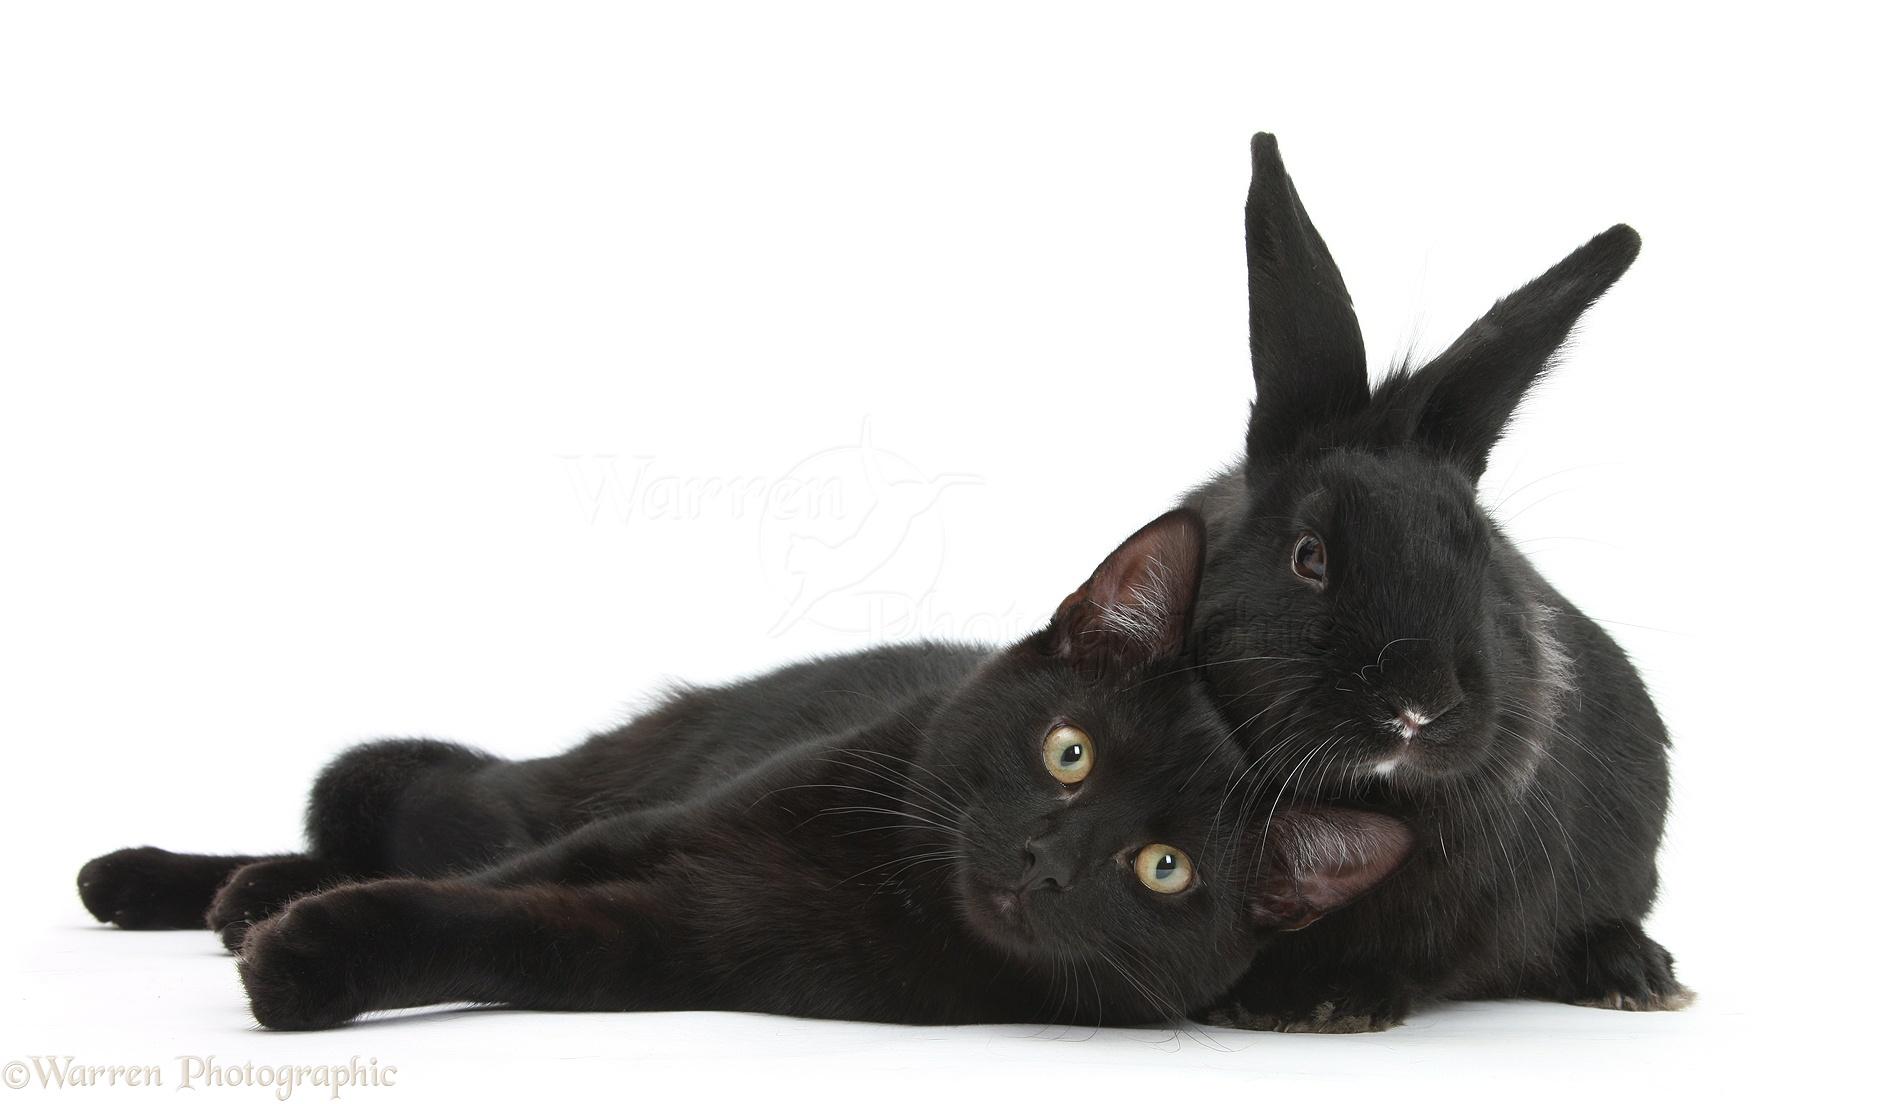 pets black cat and black rabbit photo wp20712